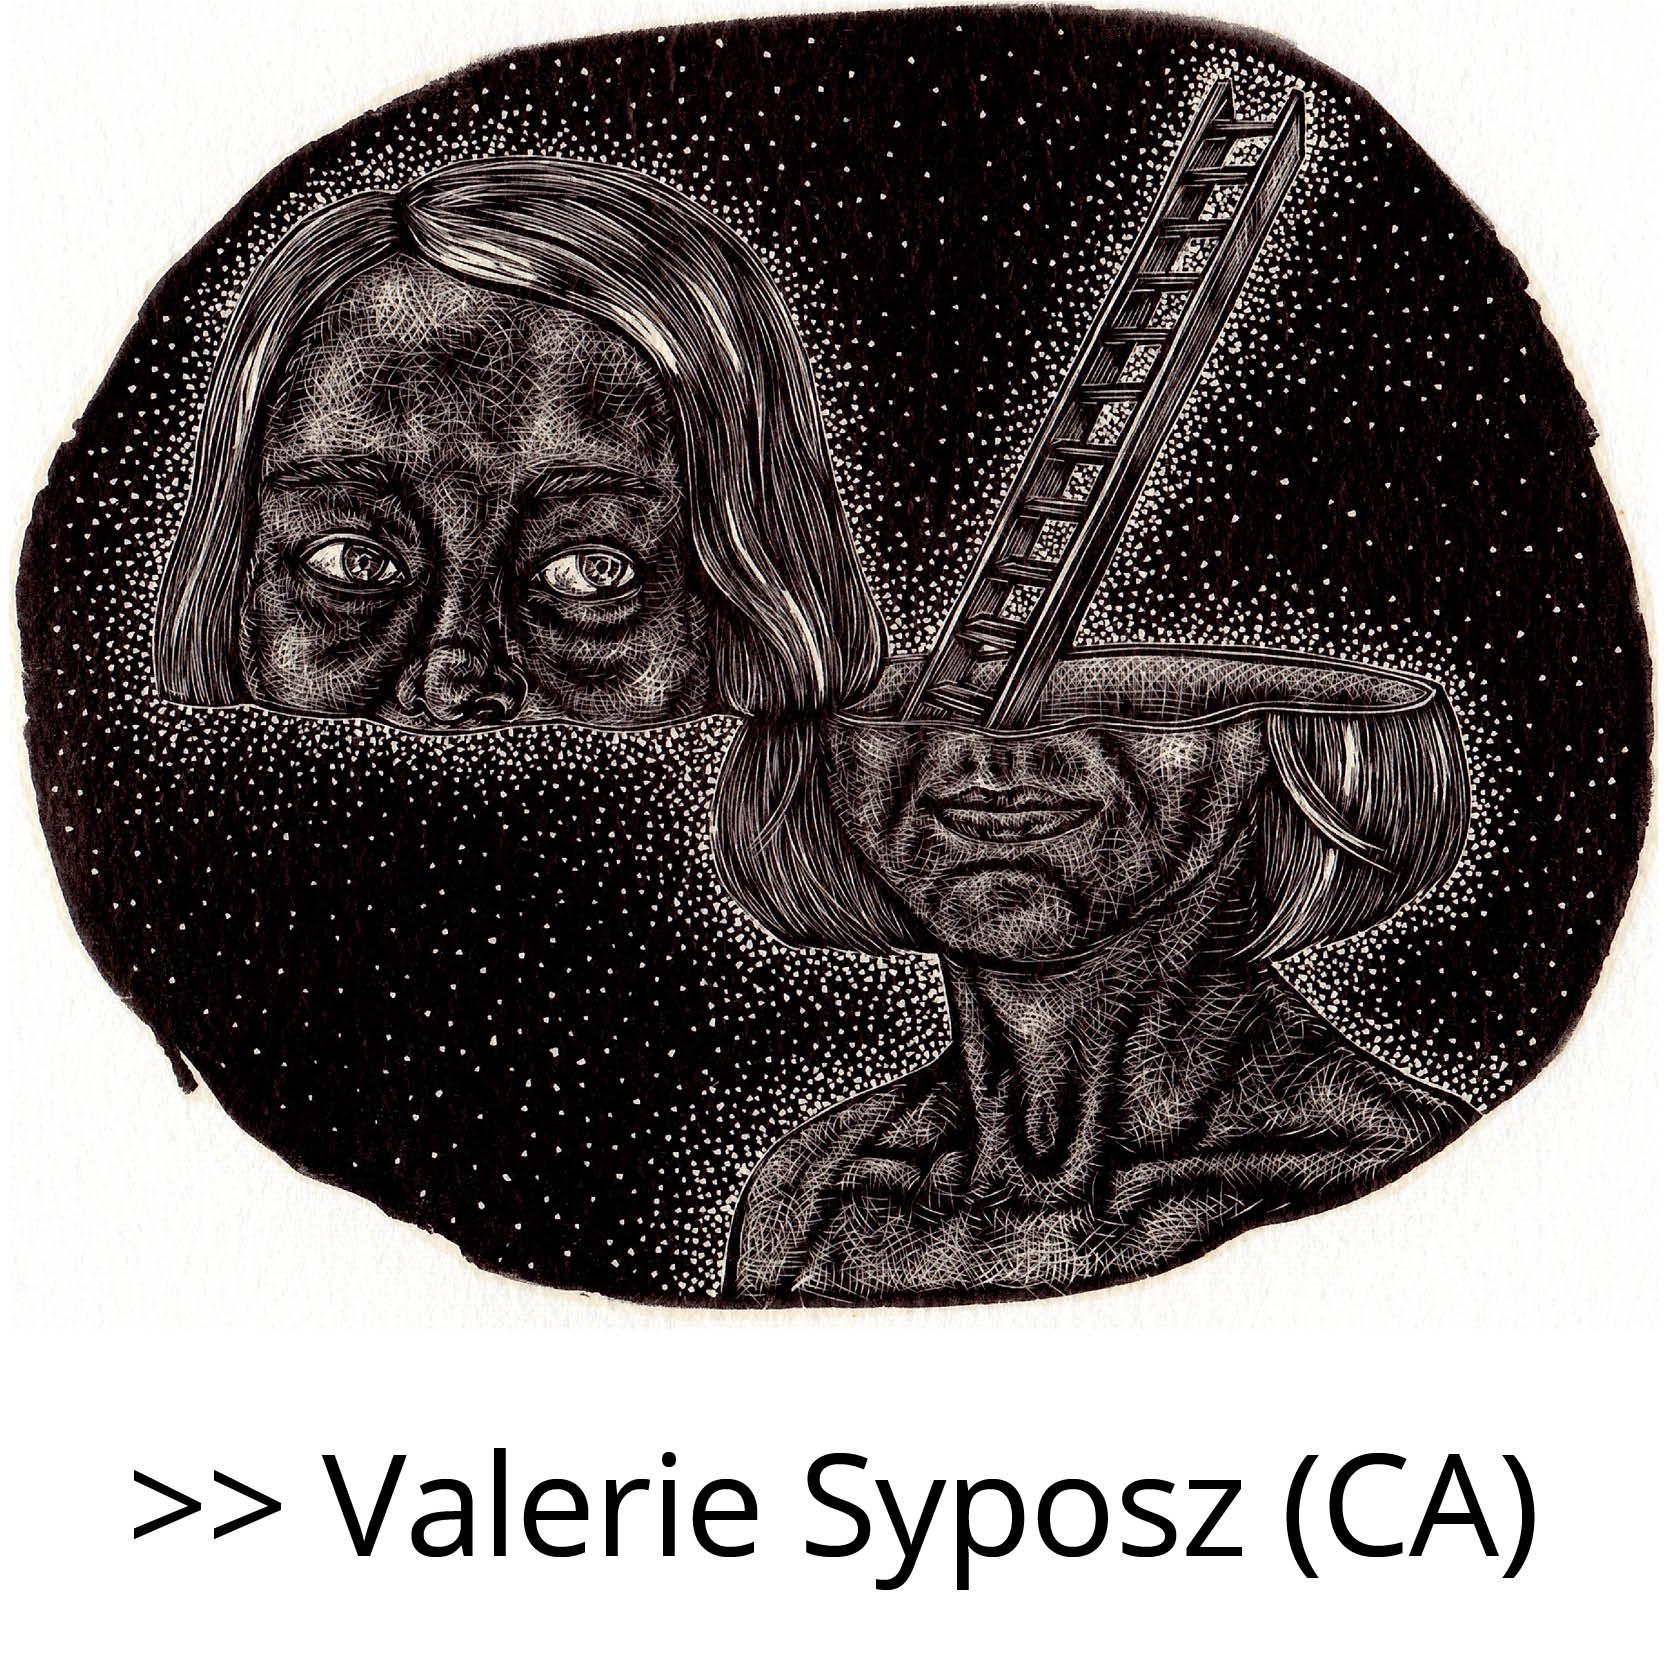 Valerie_Syposz_(CA)2